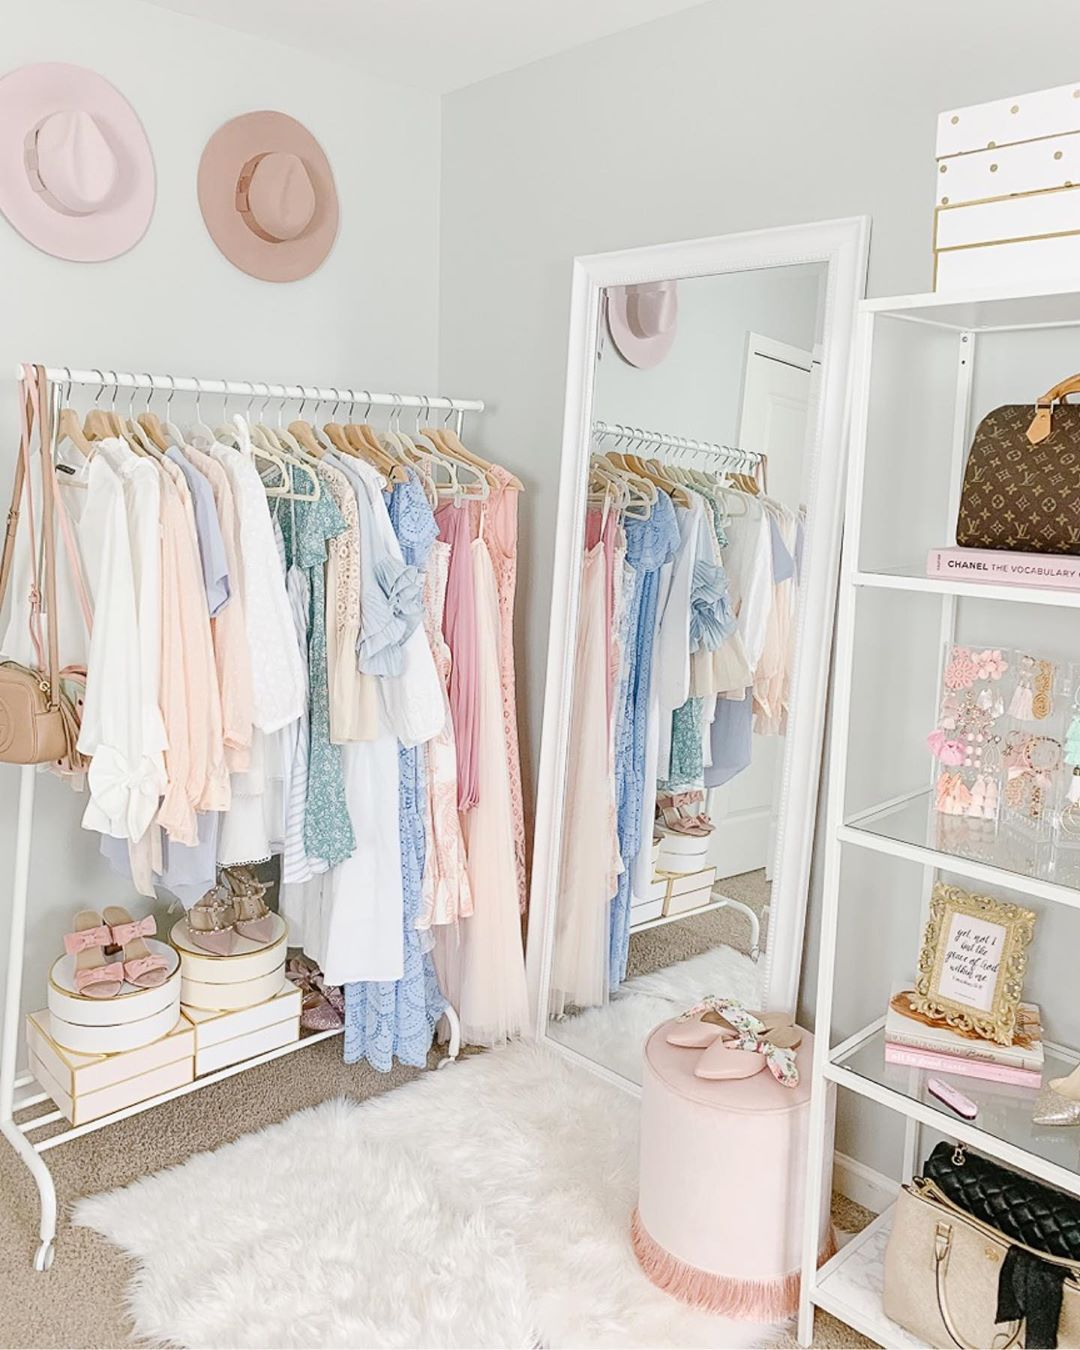 Ikea Dorm Room Ideas: Pink Office Decor Ideas, Blogger Office, Clothing Rack